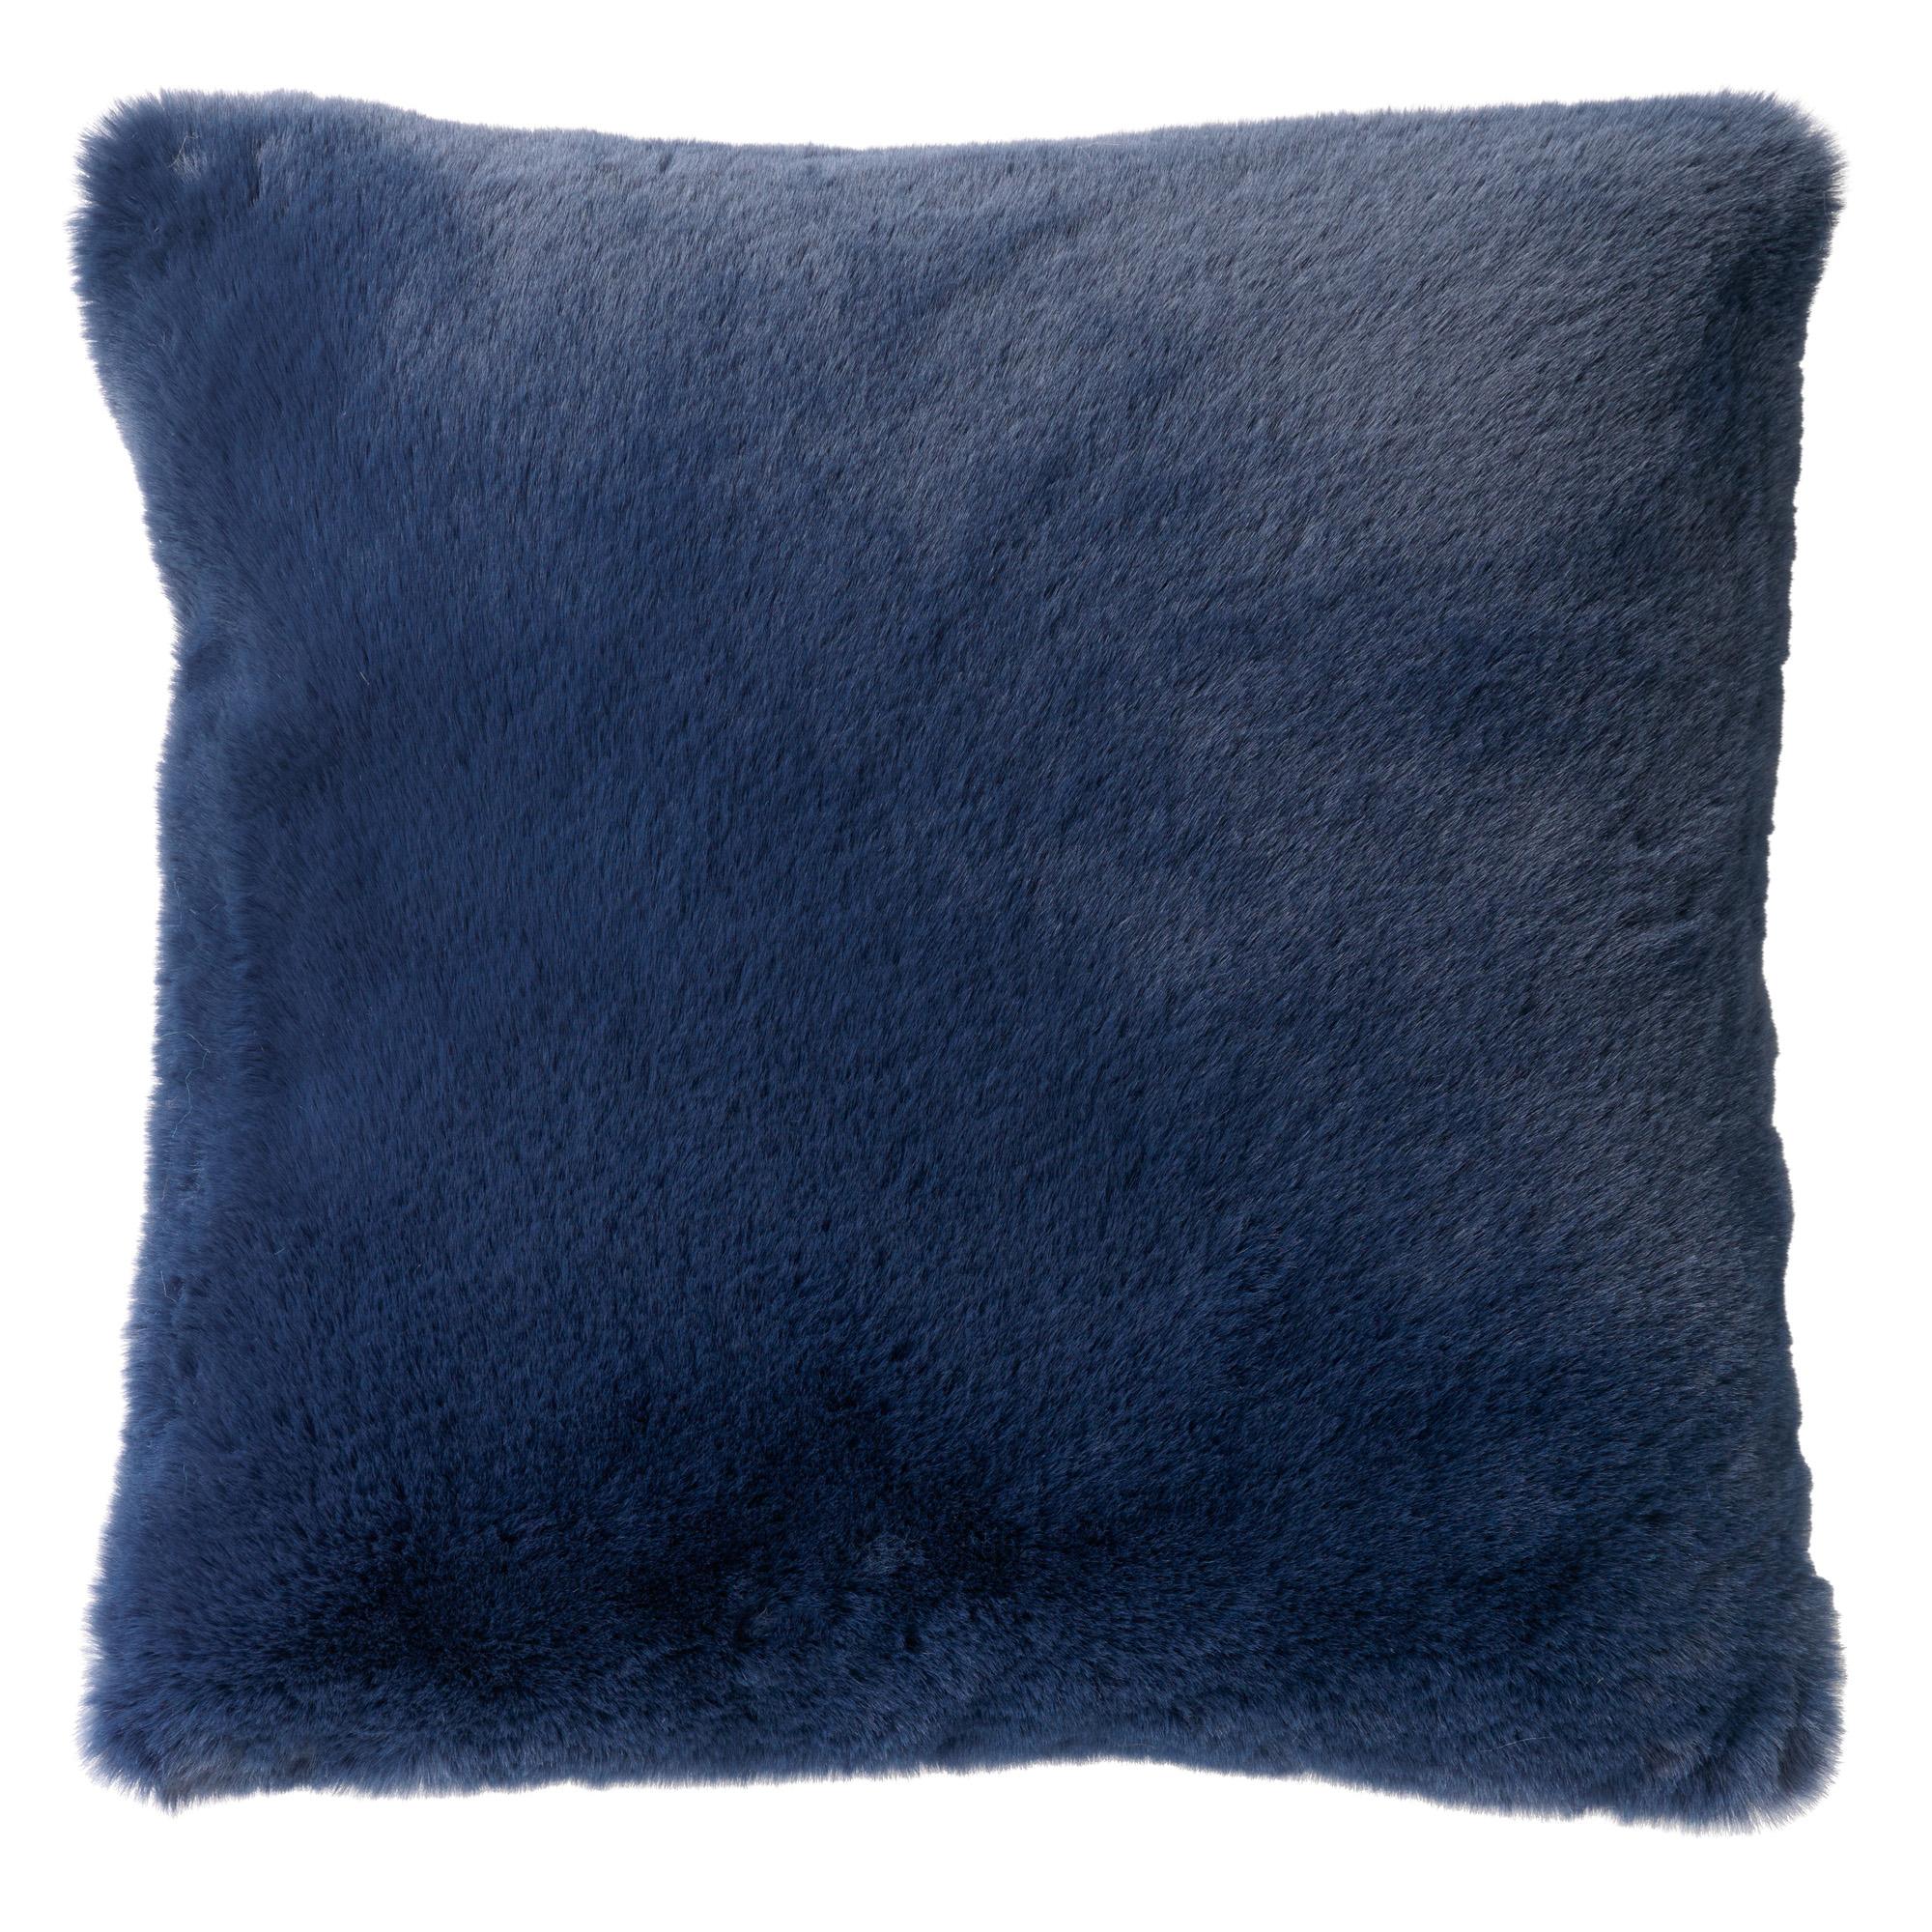 ZAYA - Sierkussen unikleur 60x60 cm Insignia Blue